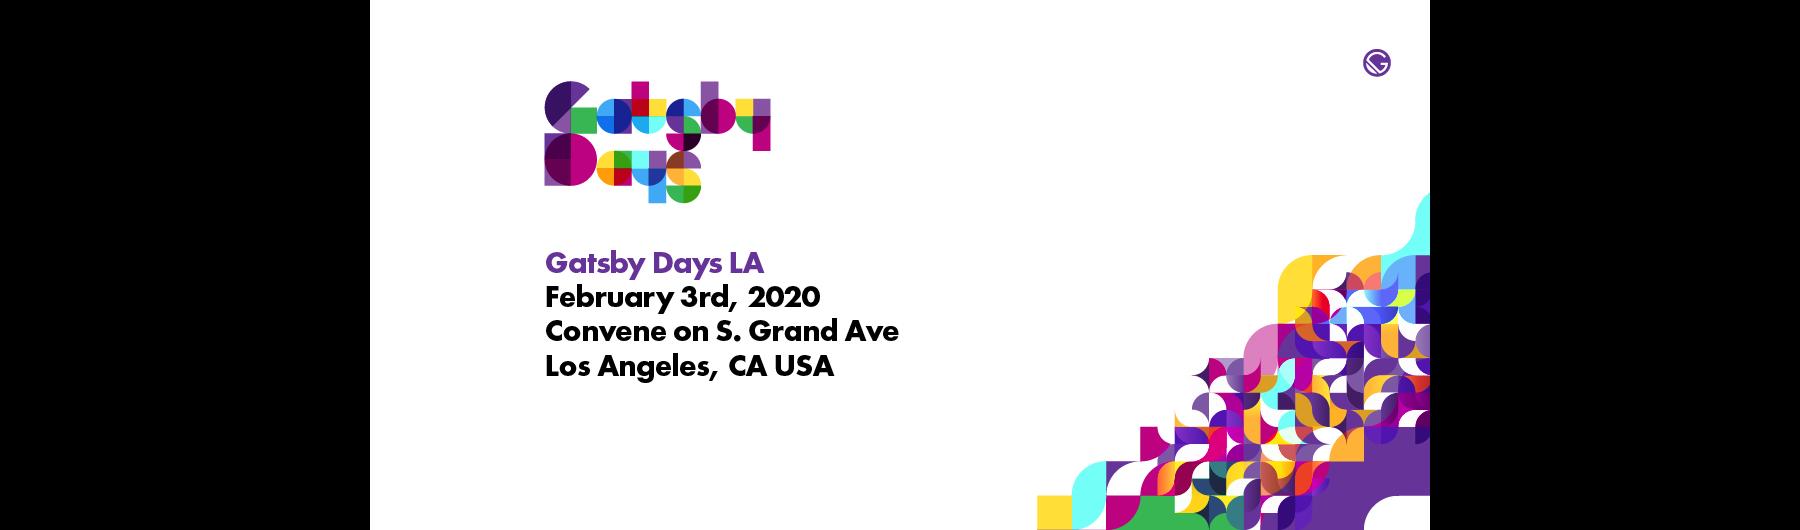 Gatsby Days Los Angeles - 2020